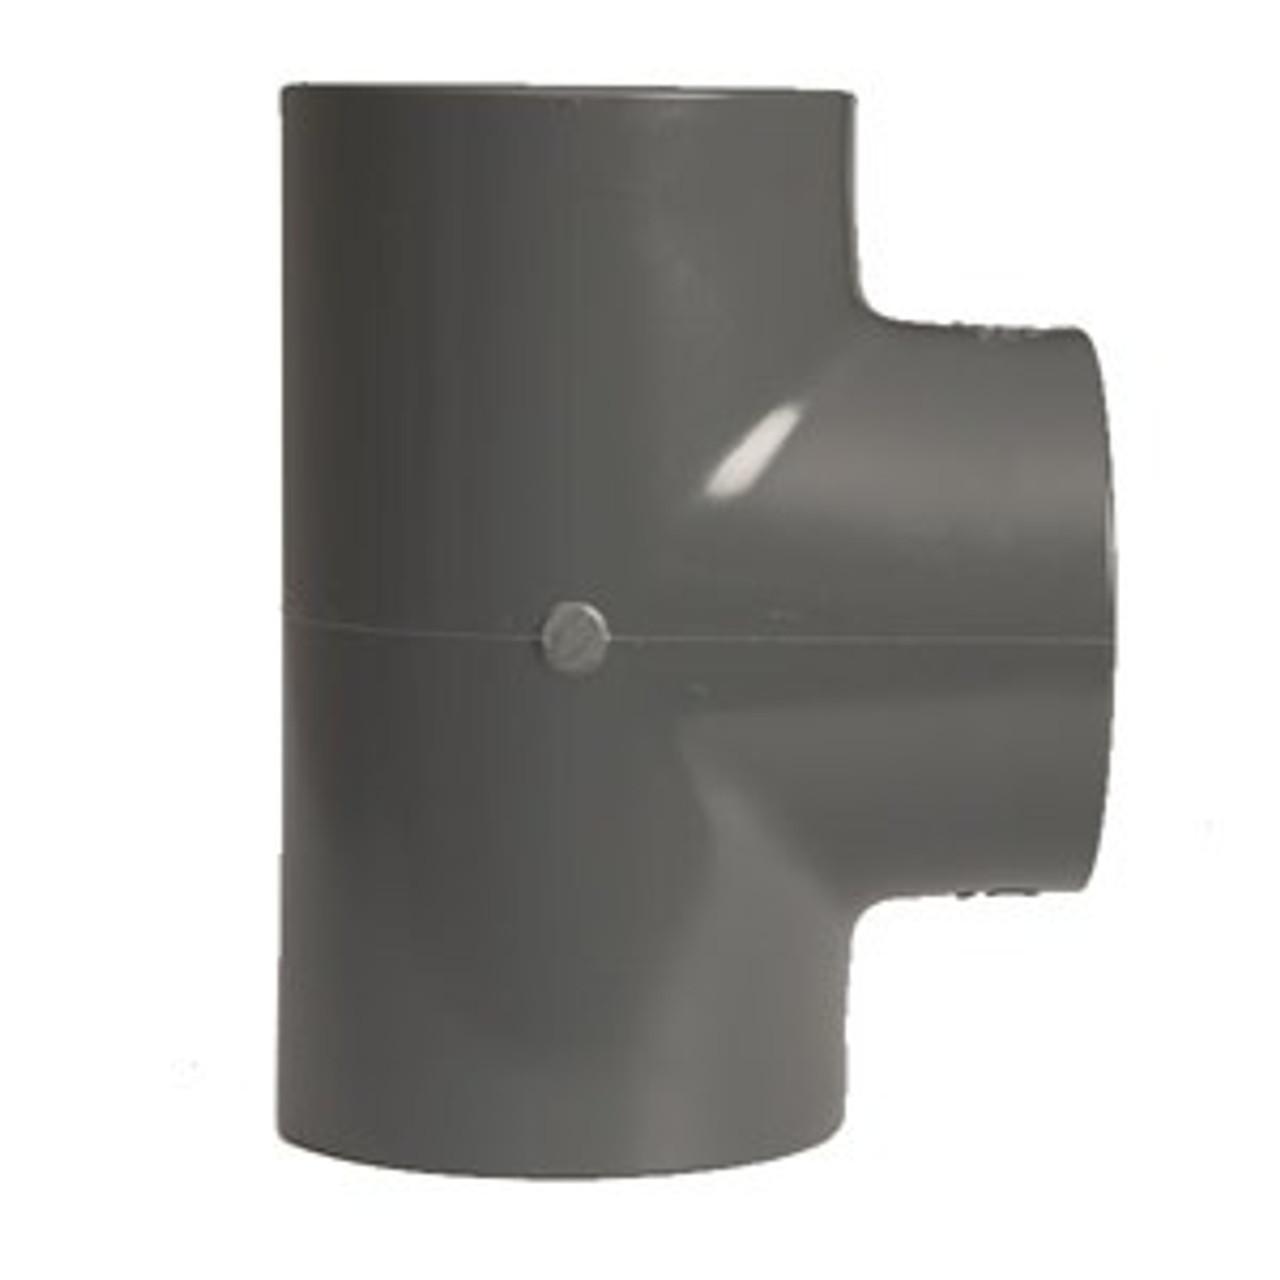 +GF+   Tee 90 Equal PVC-U 32mm (721200108)